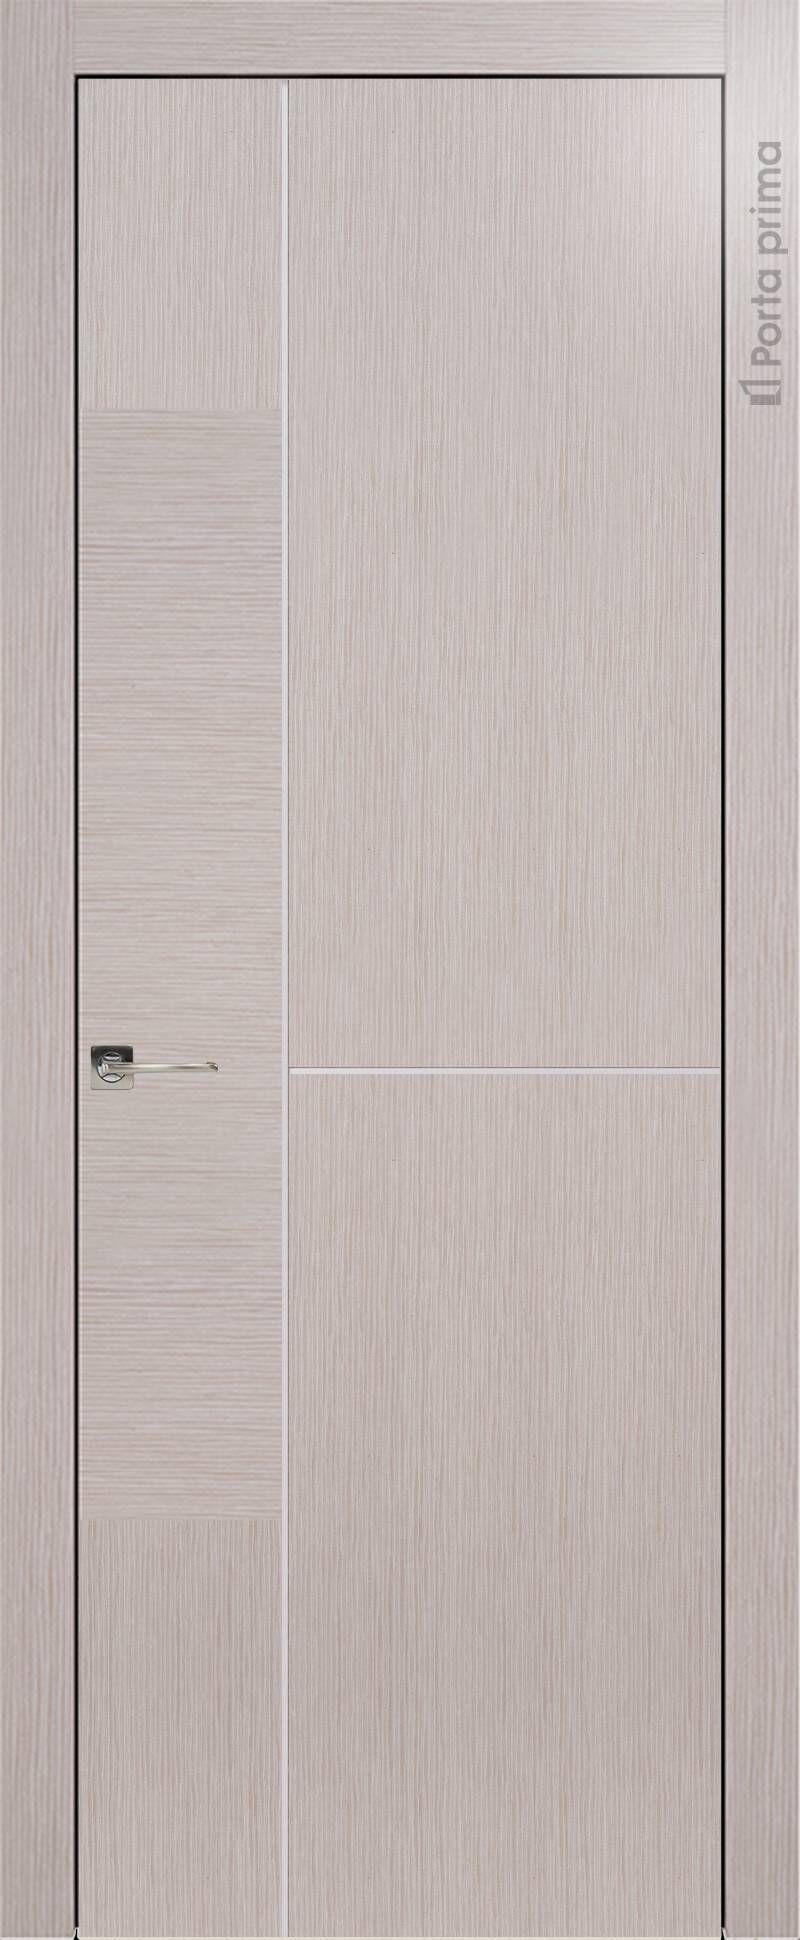 Tivoli Г-1 цвет - Дымчатый дуб Без стекла (ДГ)